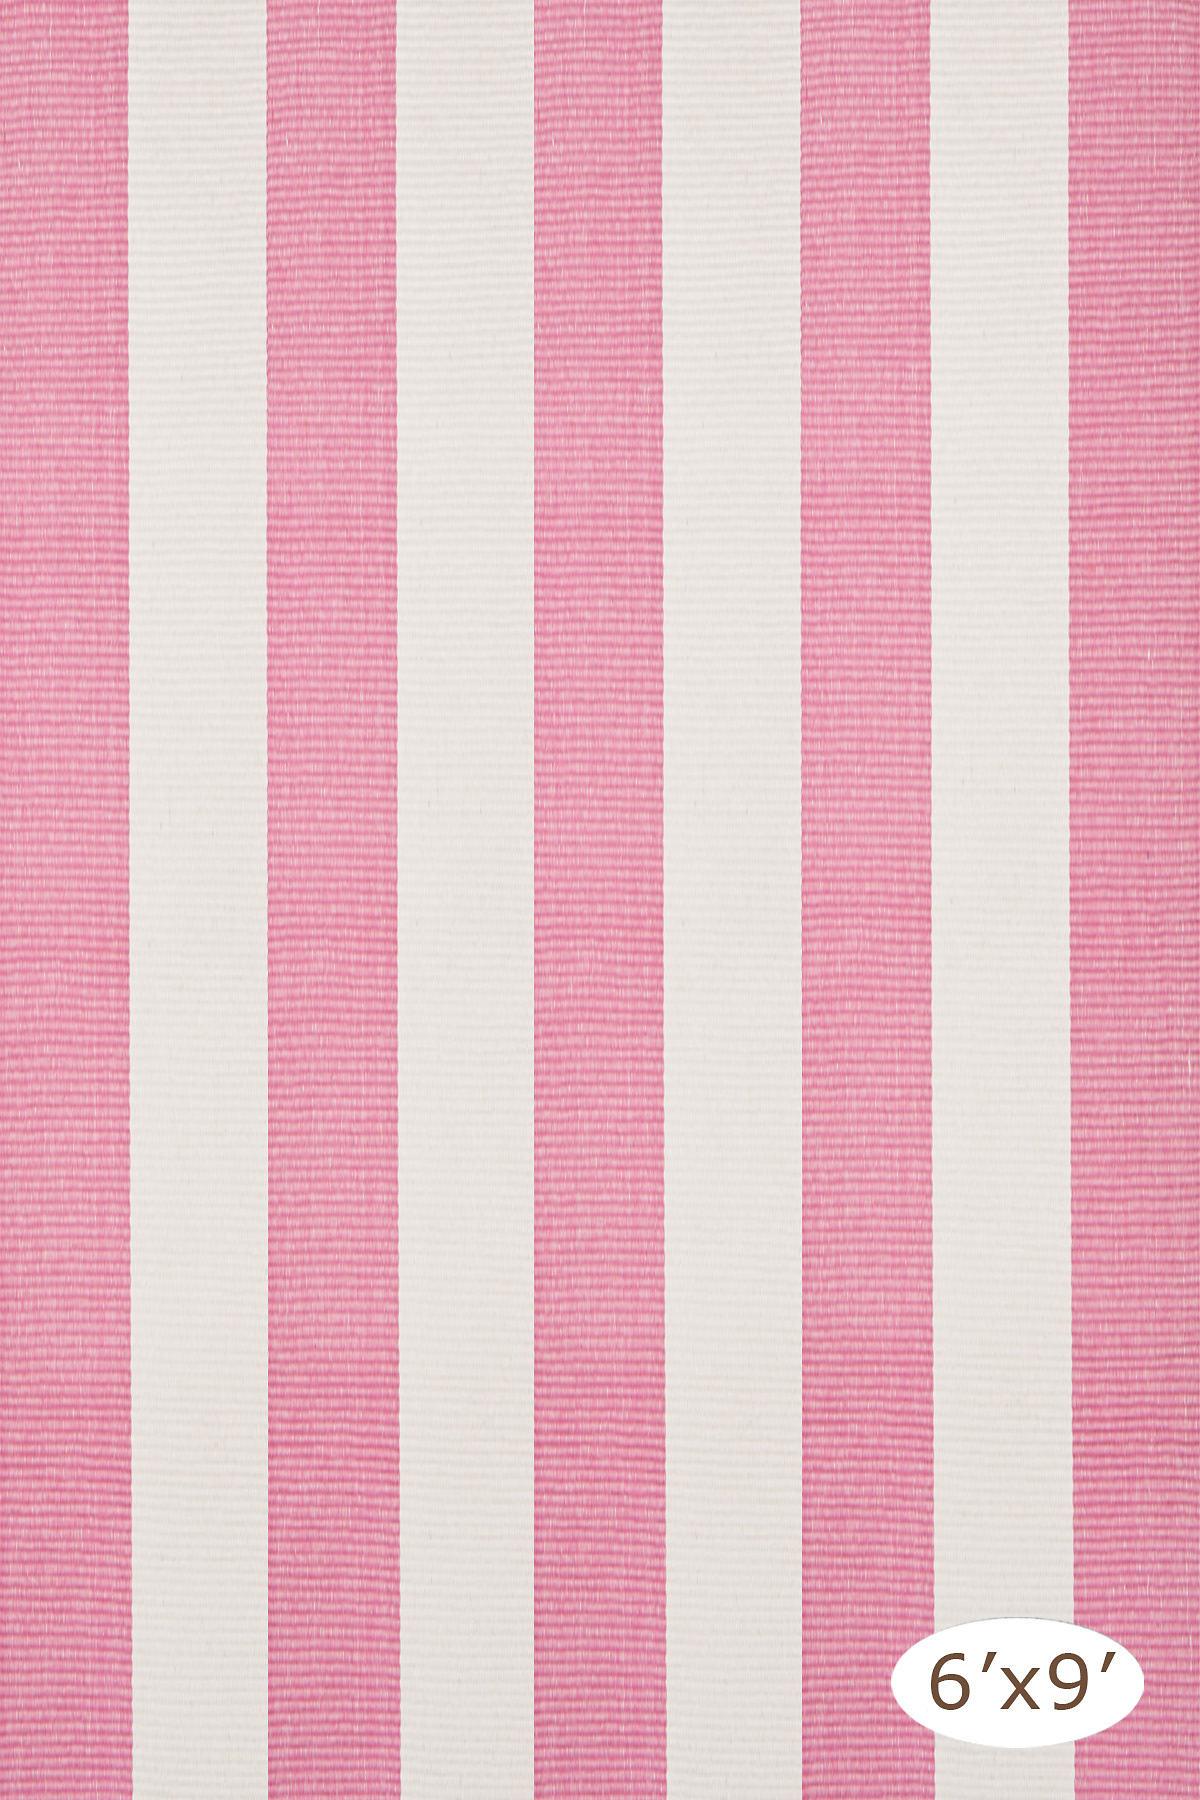 Yacht Stripe Pink/White Woven Cotton Rug